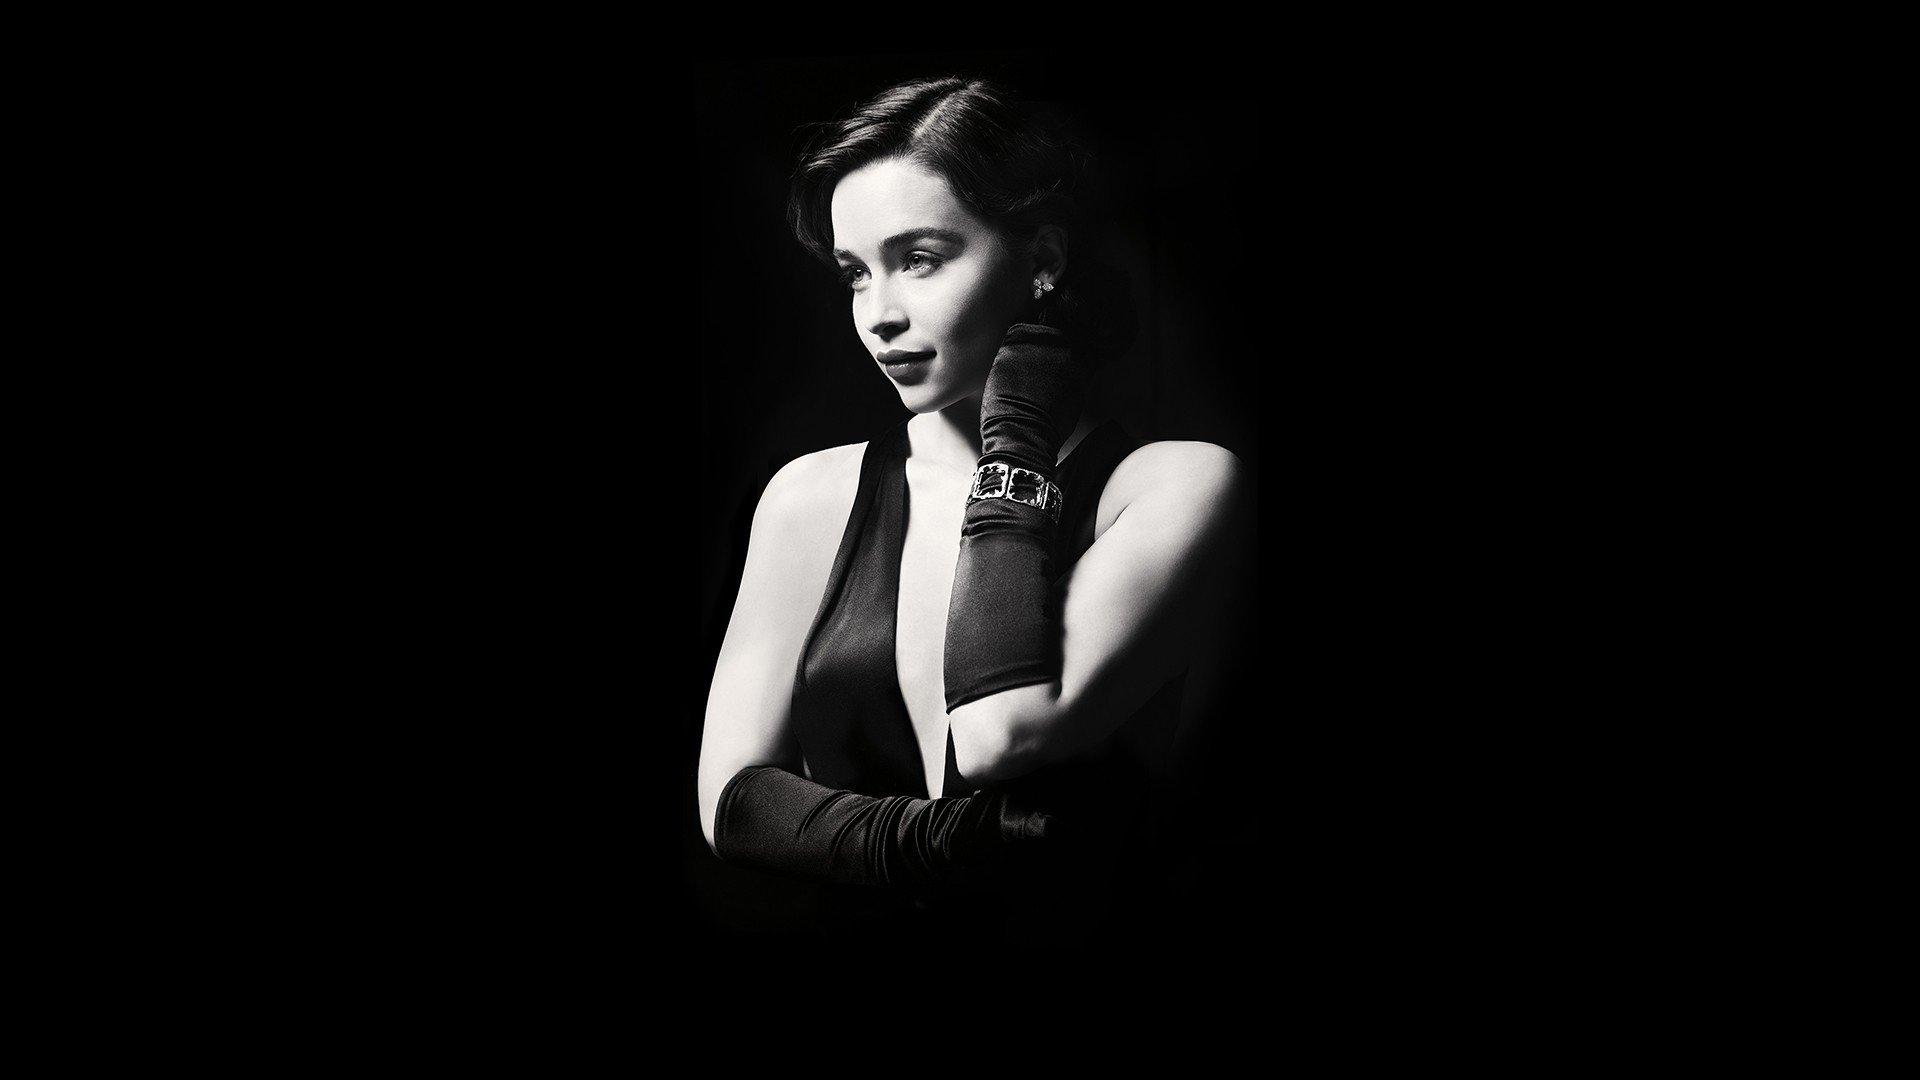 Emilia Clarke, Monochrome, Women Wallpaper